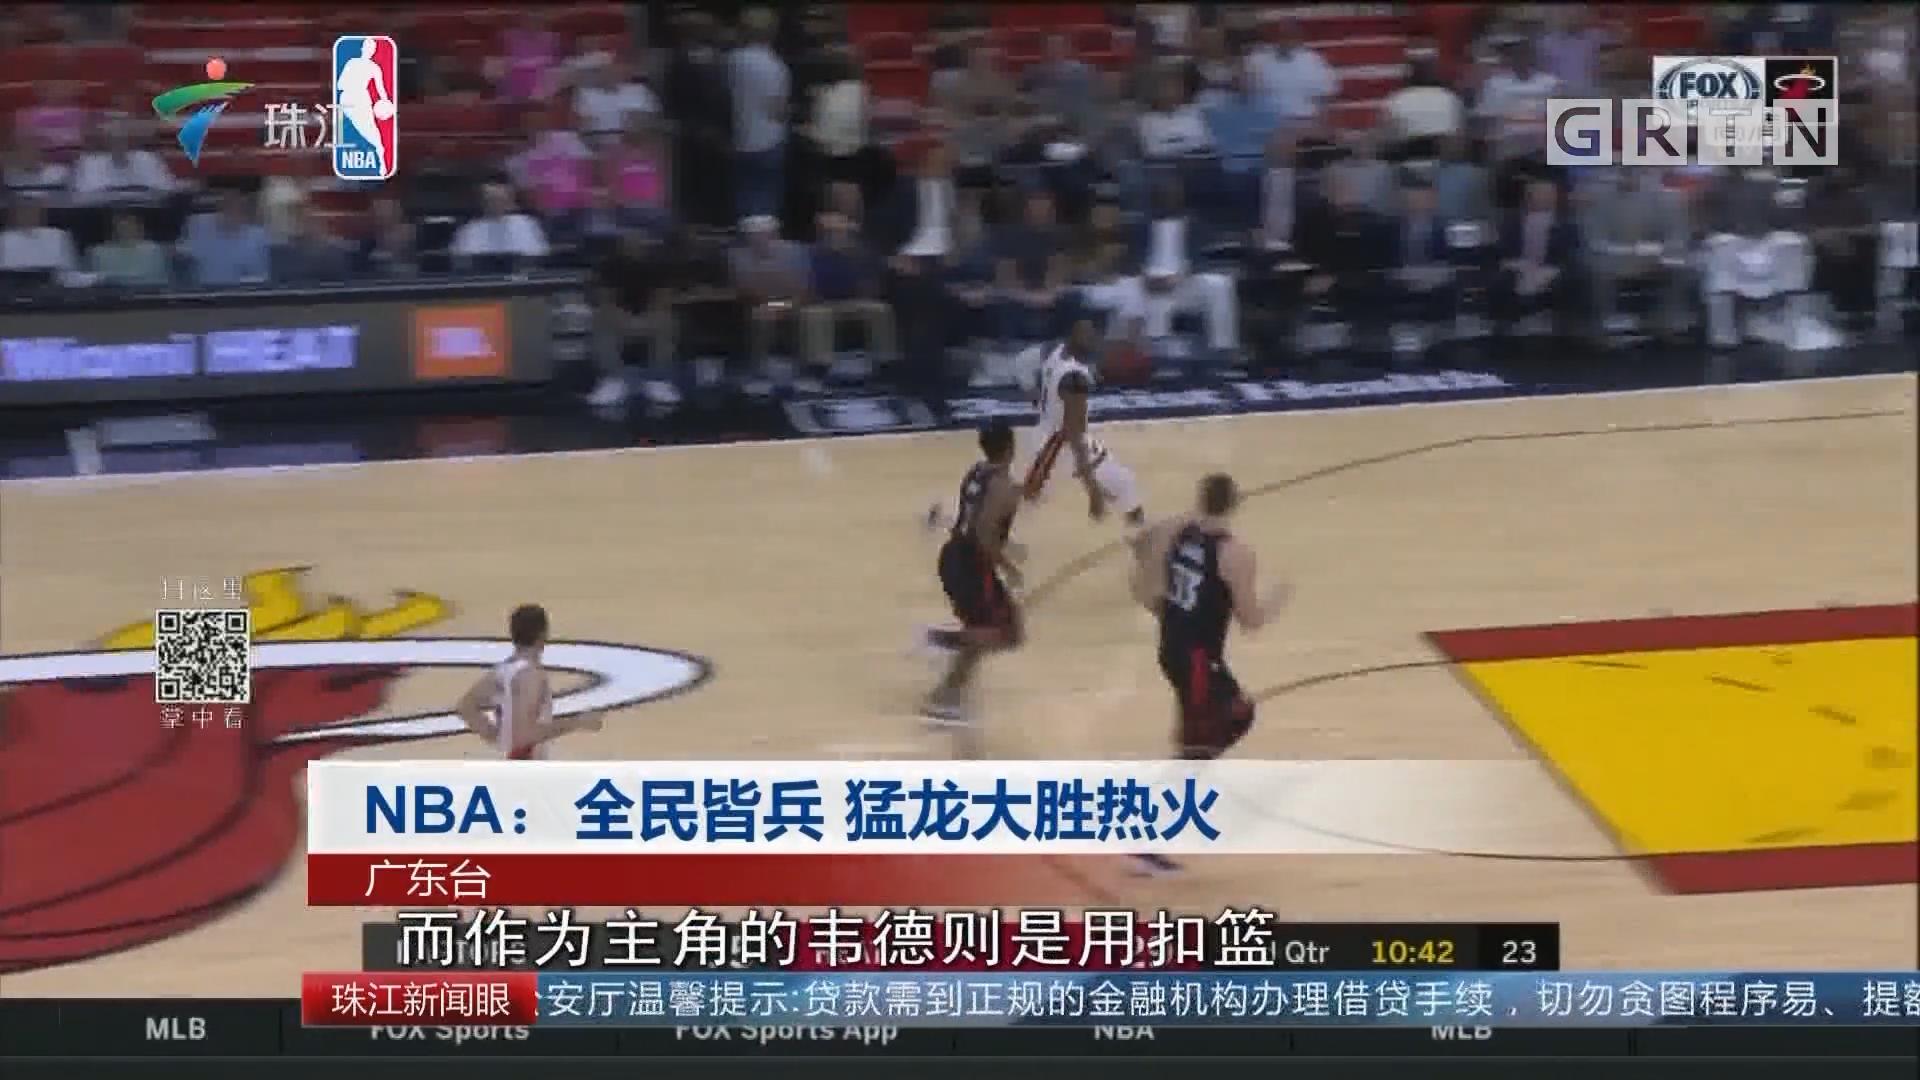 NBA:全民皆兵 猛龙大胜热火